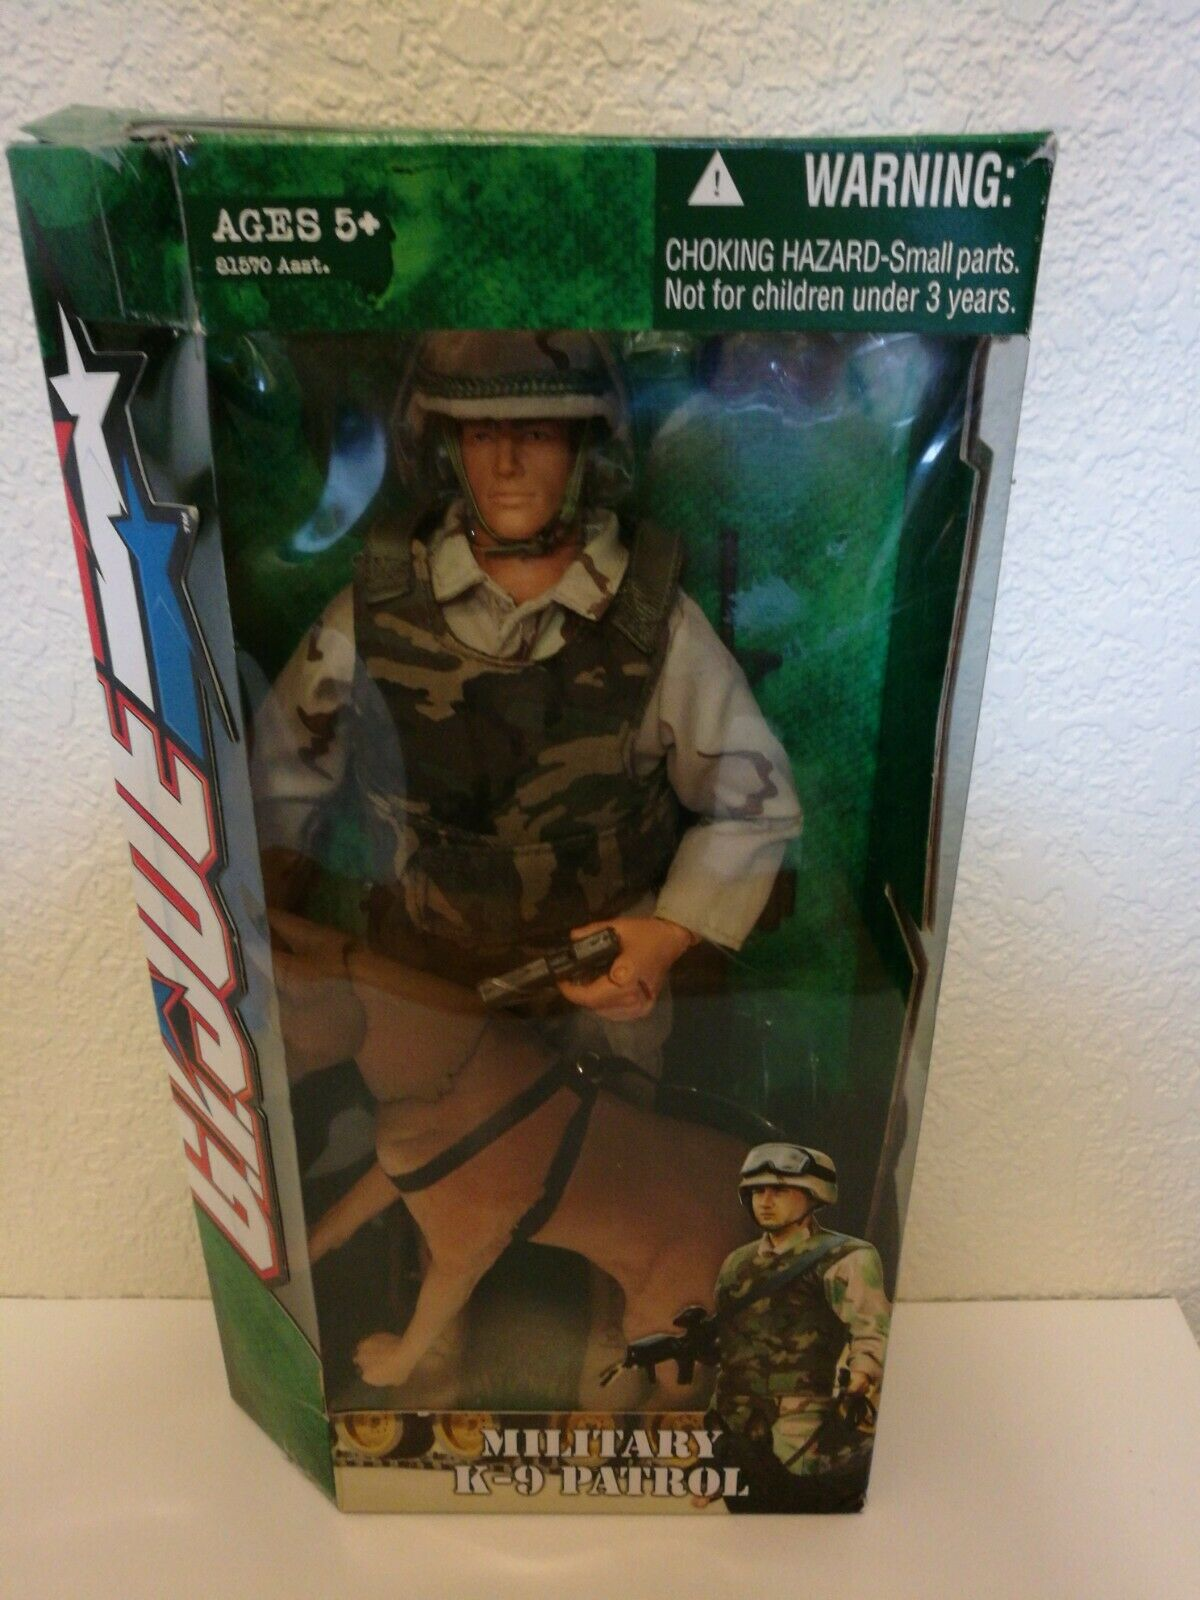 2004 Gi Joe patrulla militar K-9 con marrón pastor alemán Hasbro G.i Joe